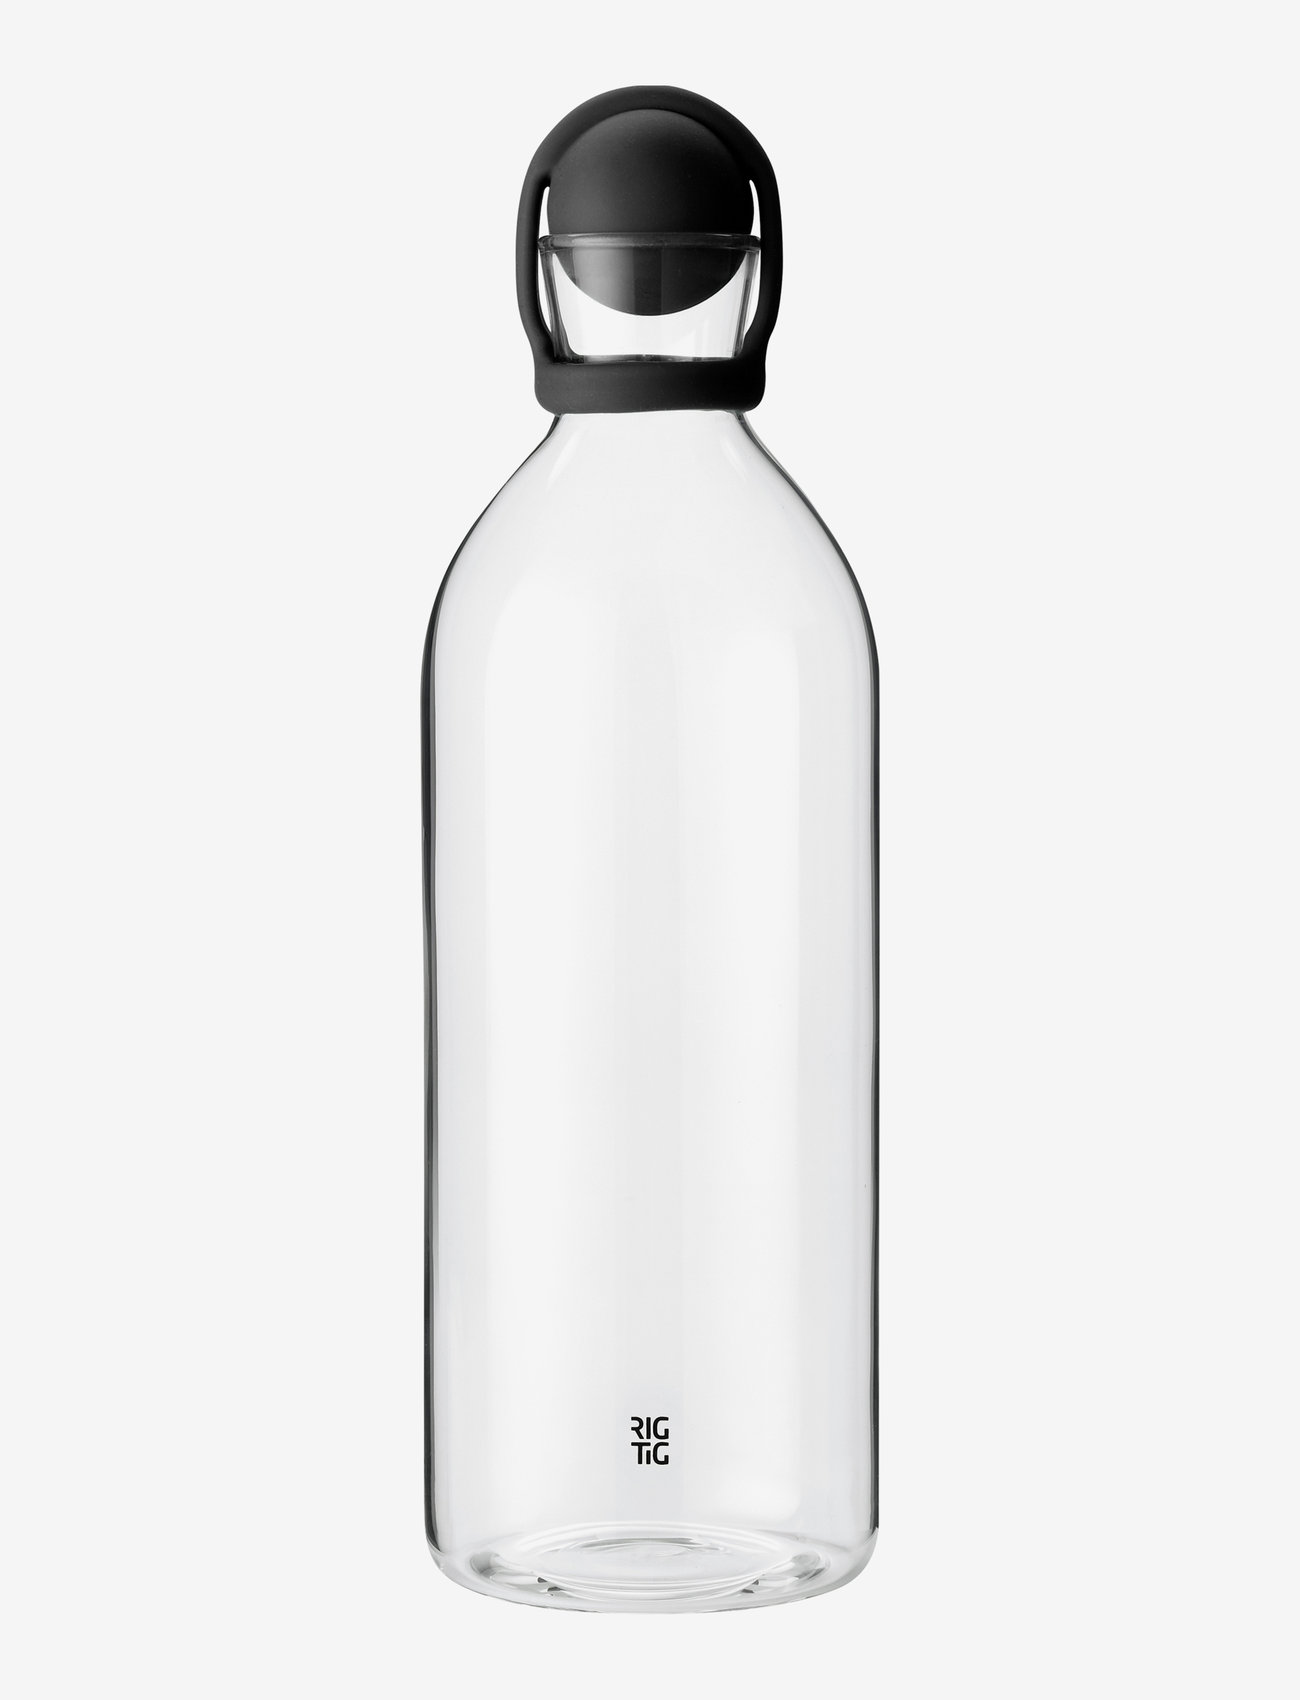 RIG-TIG - COOL-IT water carafe, 1.5 l. - vesikannut ja -karahvit - black - 1